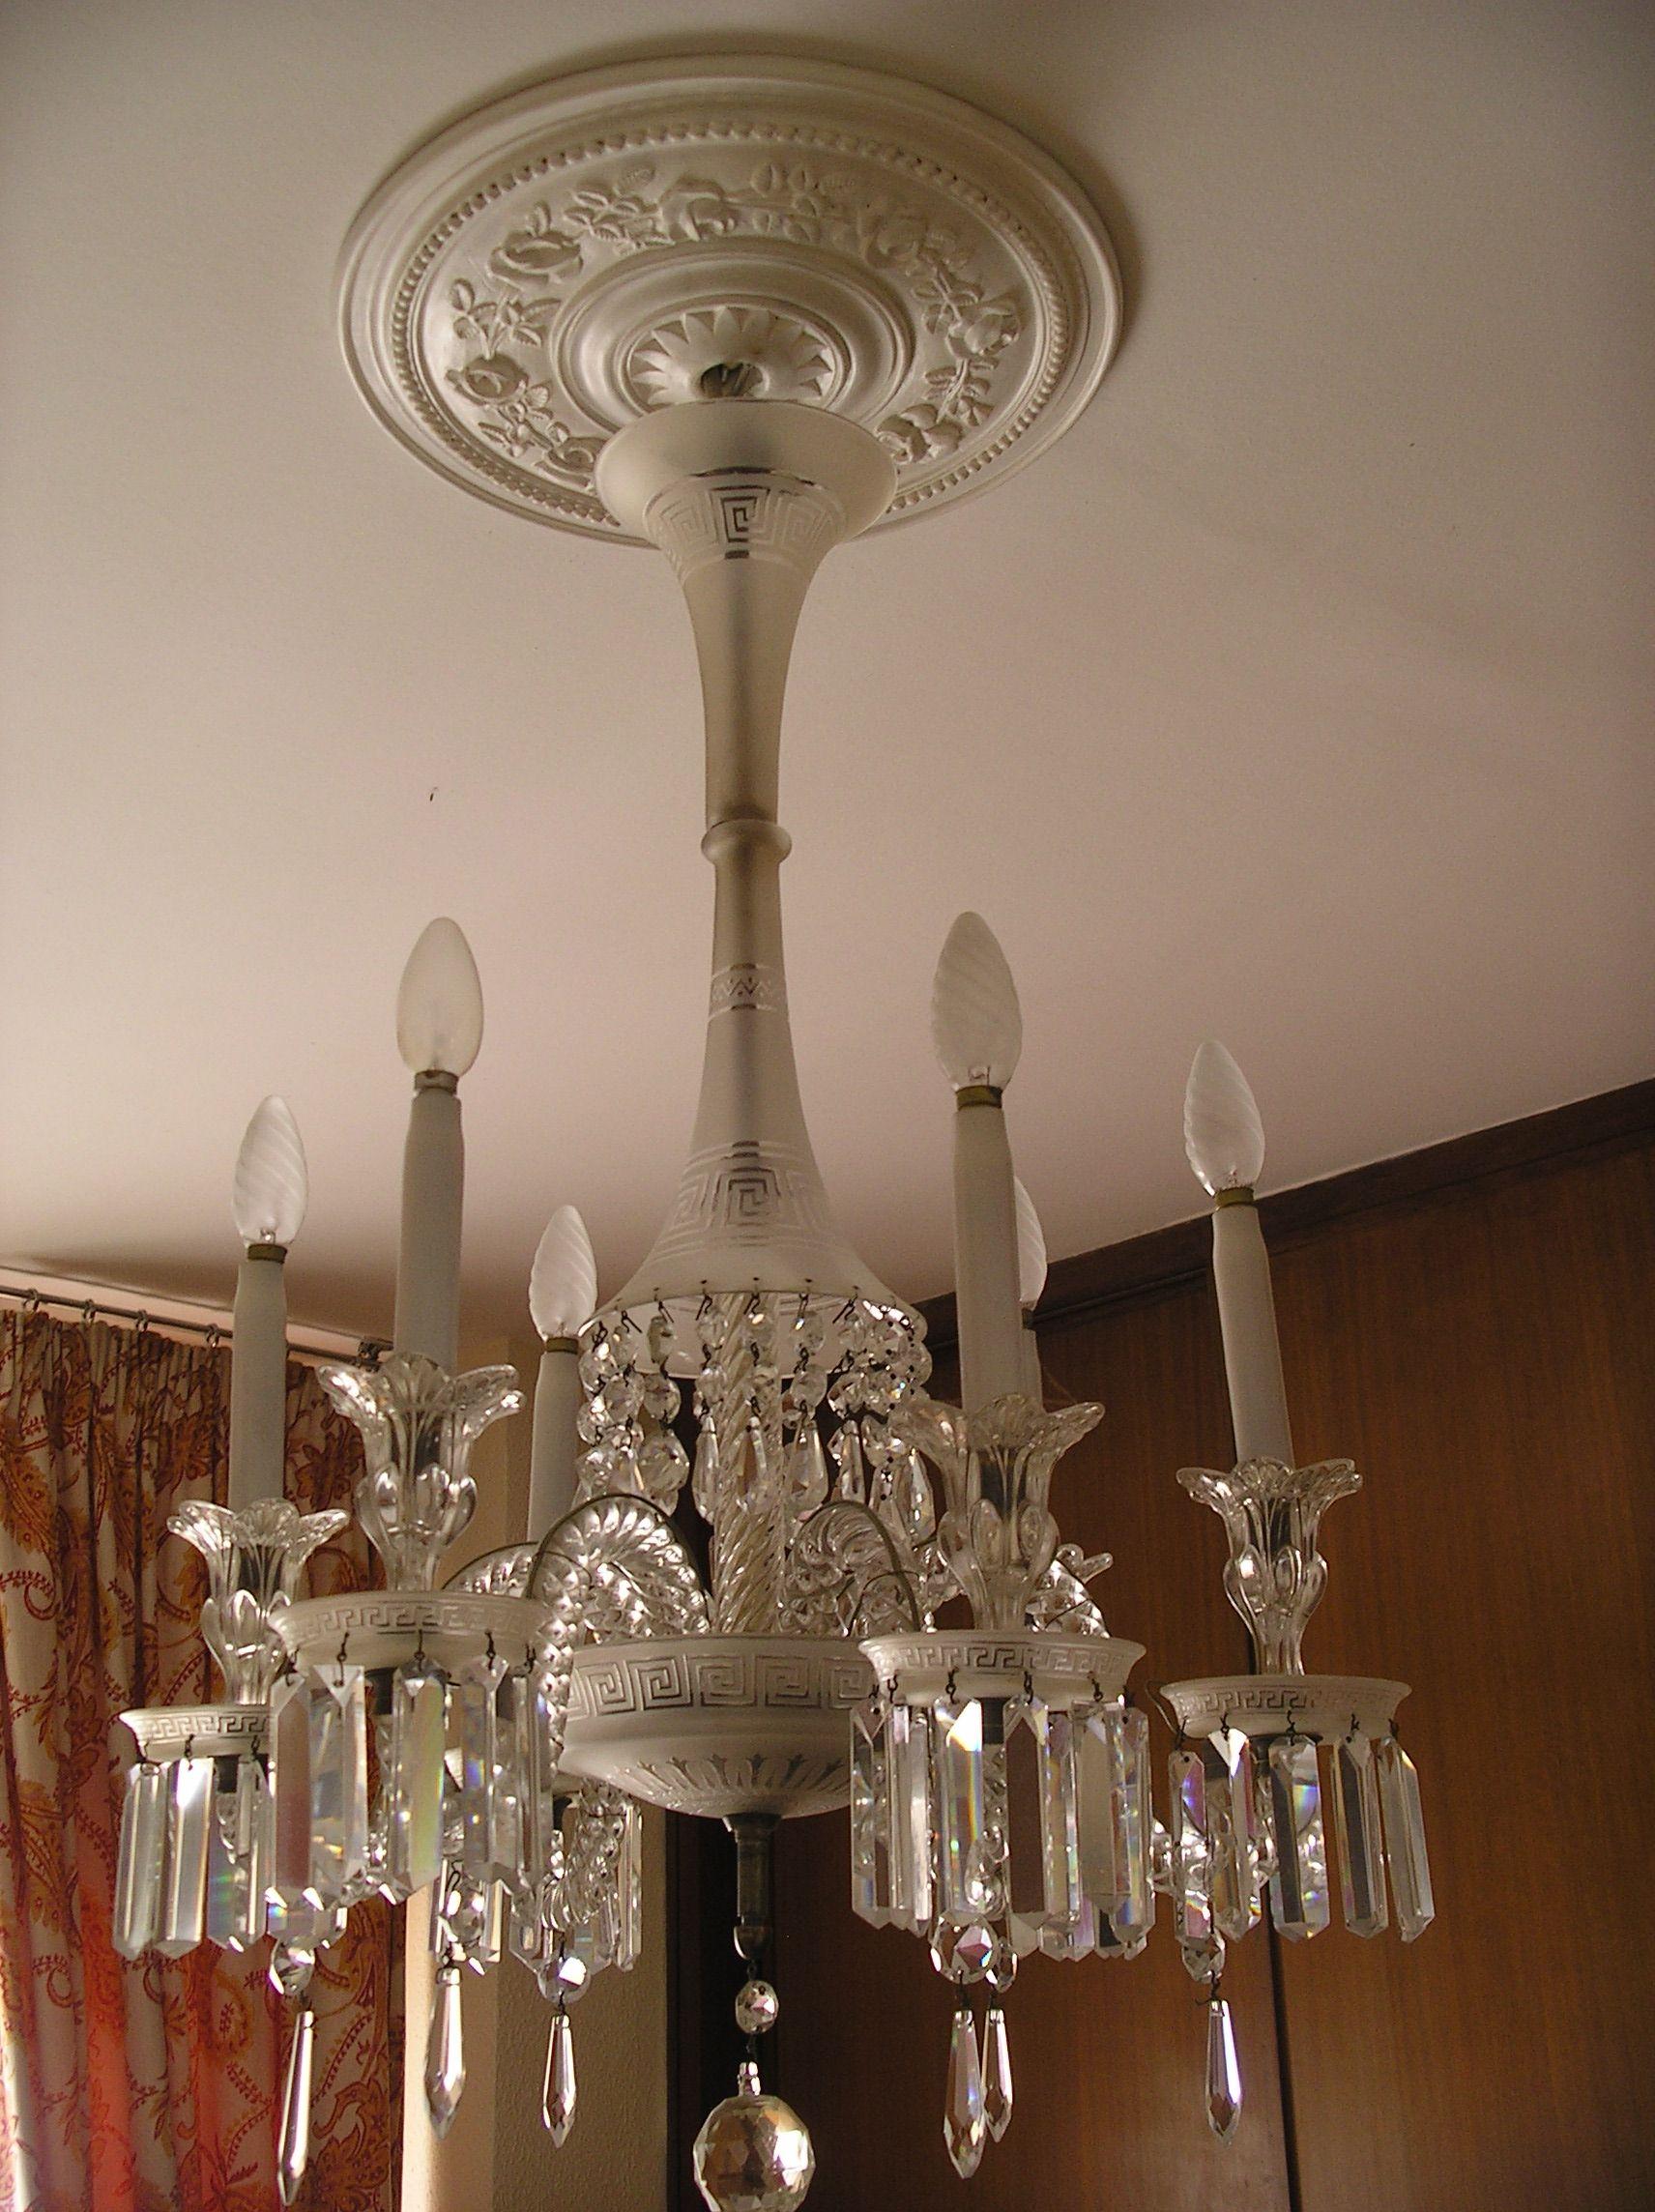 L mpara de cristal de baccarat s xviii antig edades mias pinterest chandeliers glass - Lamparas de cristal antiguas ...